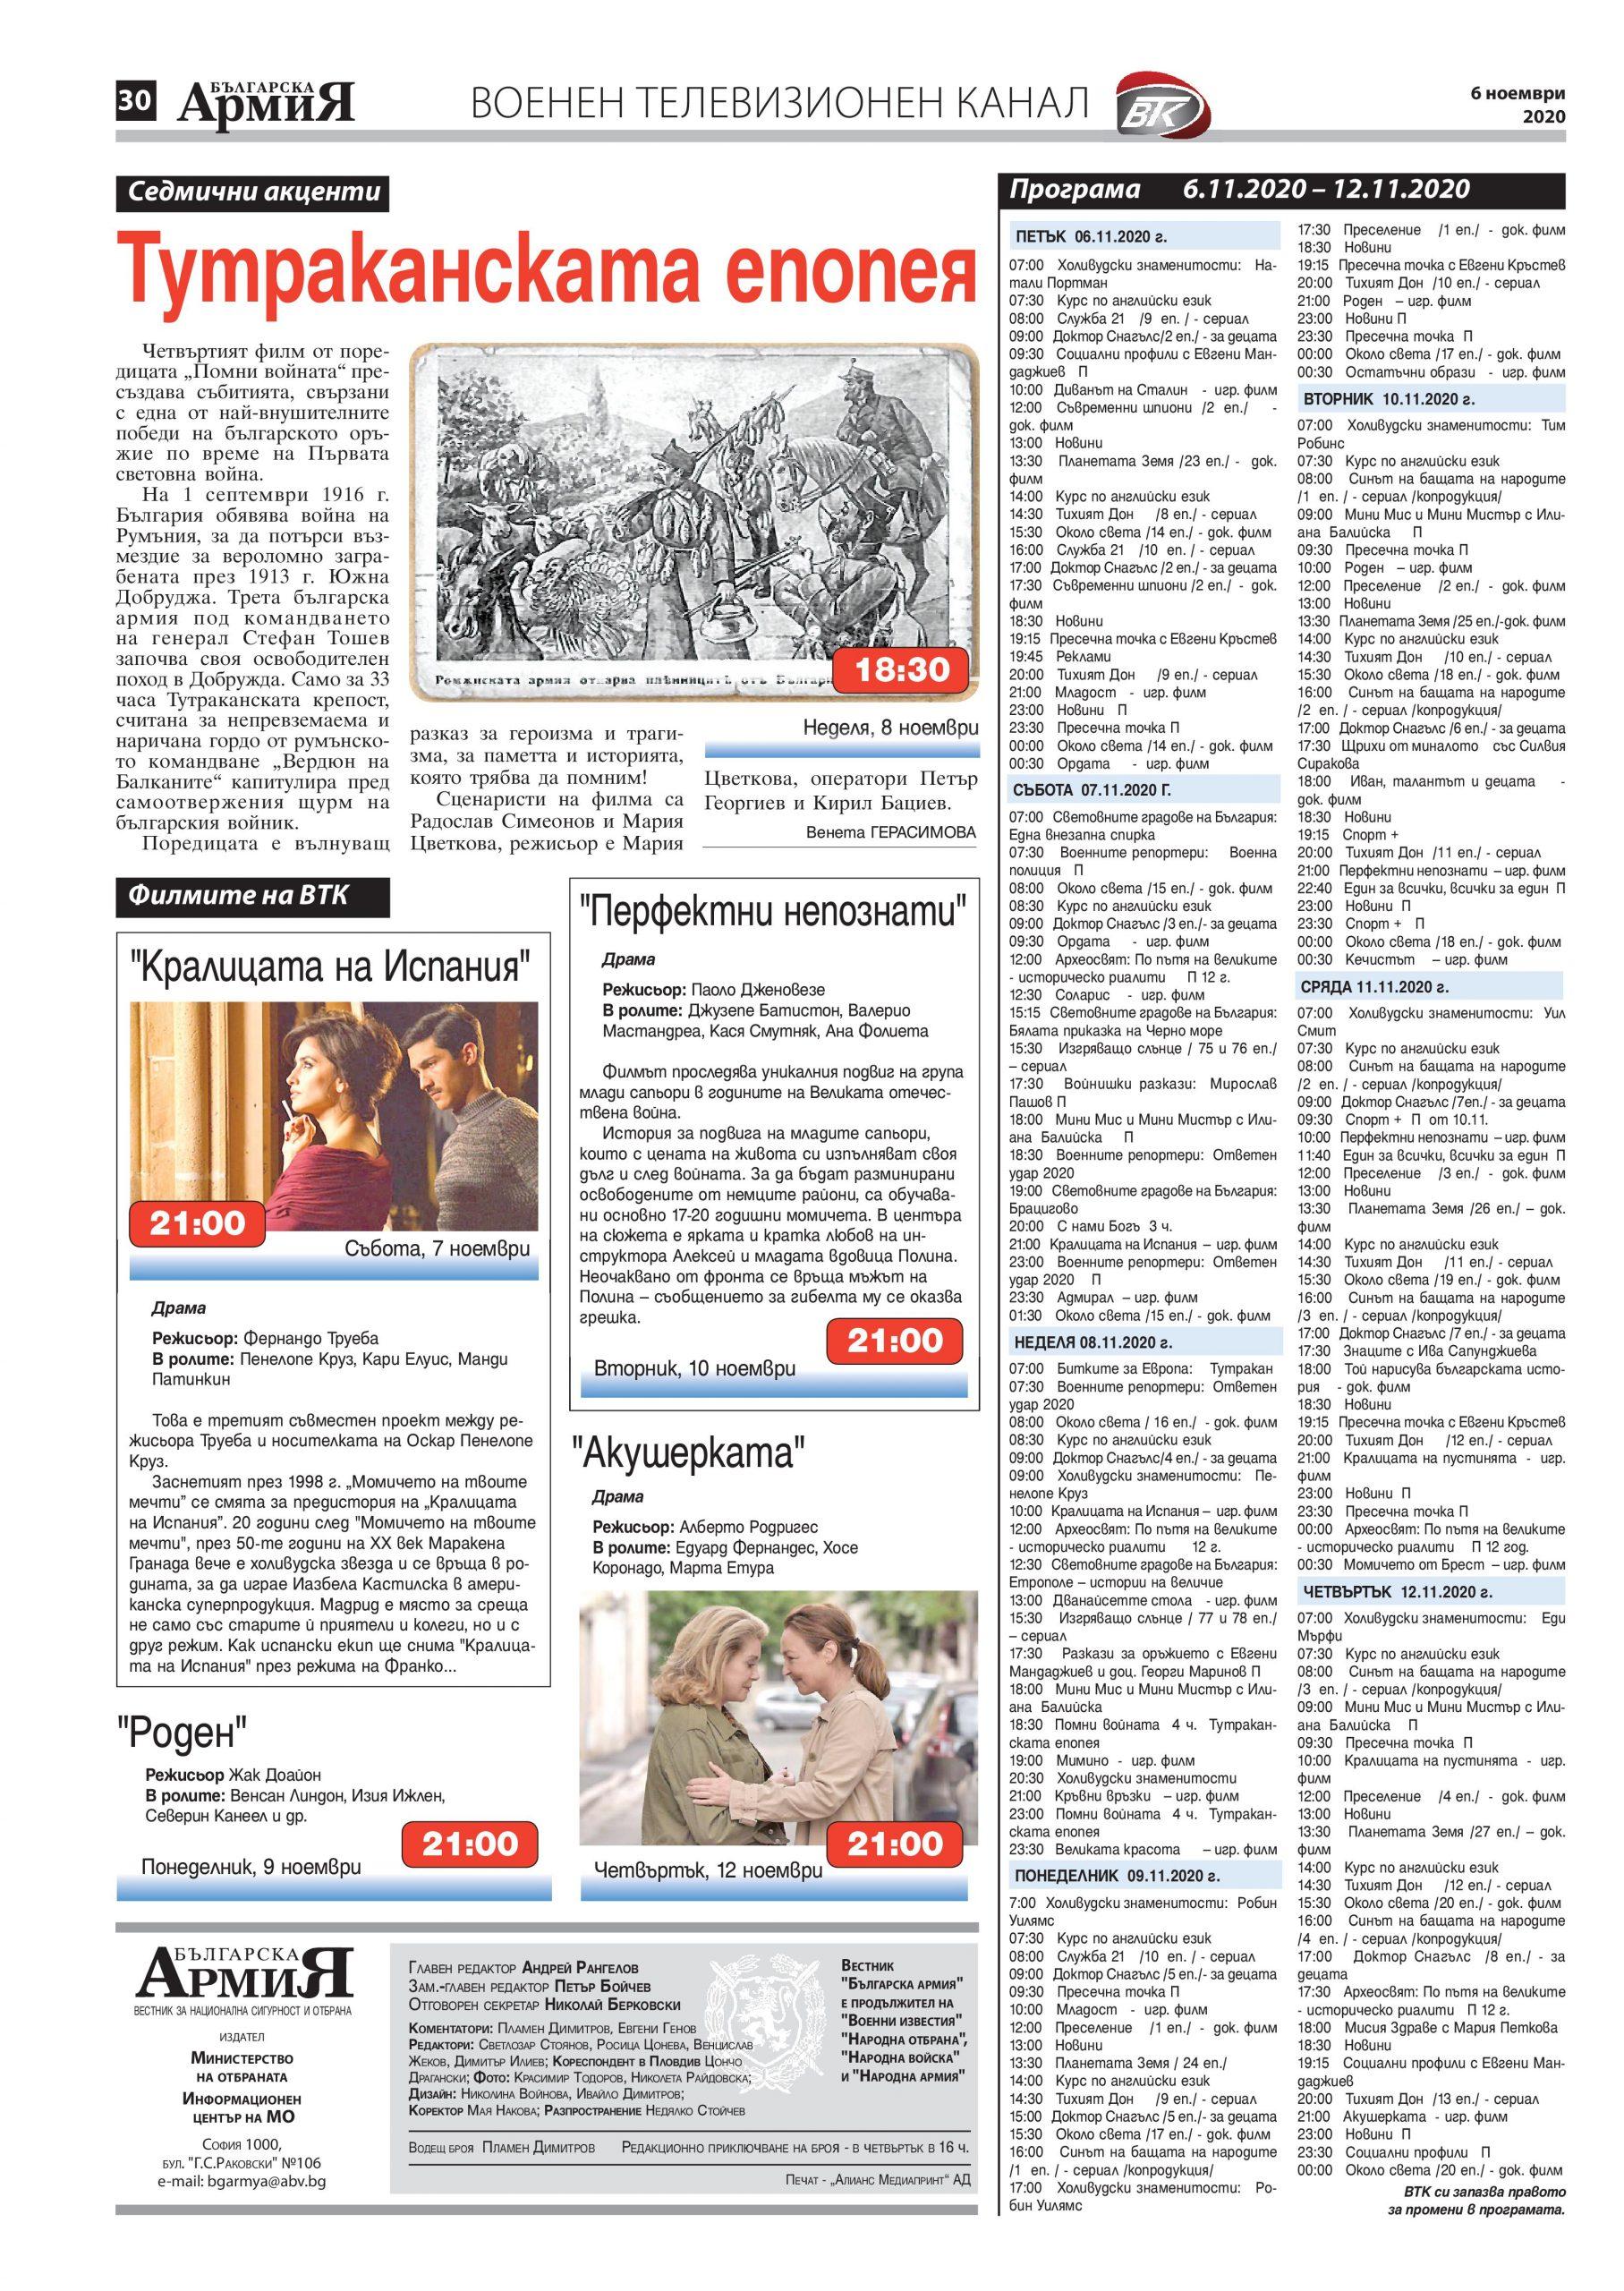 https://armymedia.bg/wp-content/uploads/2015/06/30-43-scaled.jpg